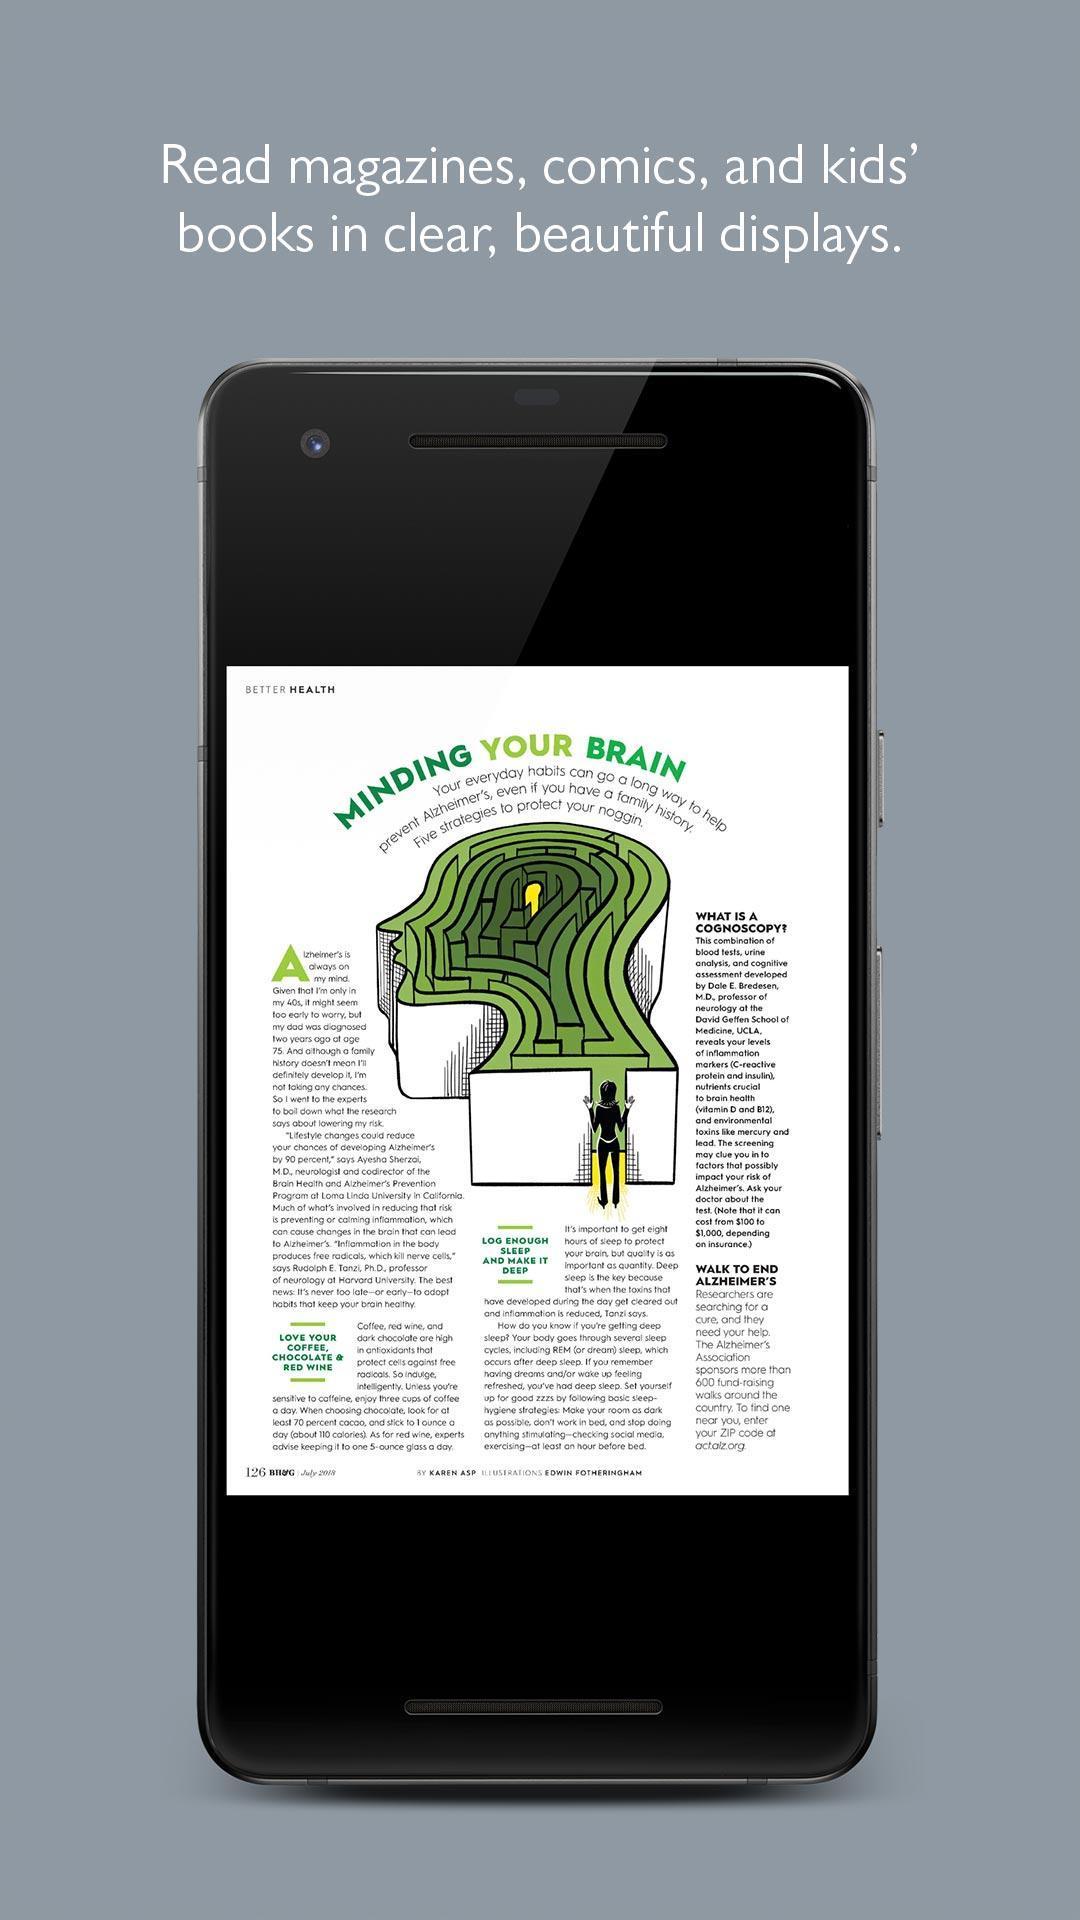 NOOK Read eBooks & Magazines 5.1.0.27 Screenshot 3